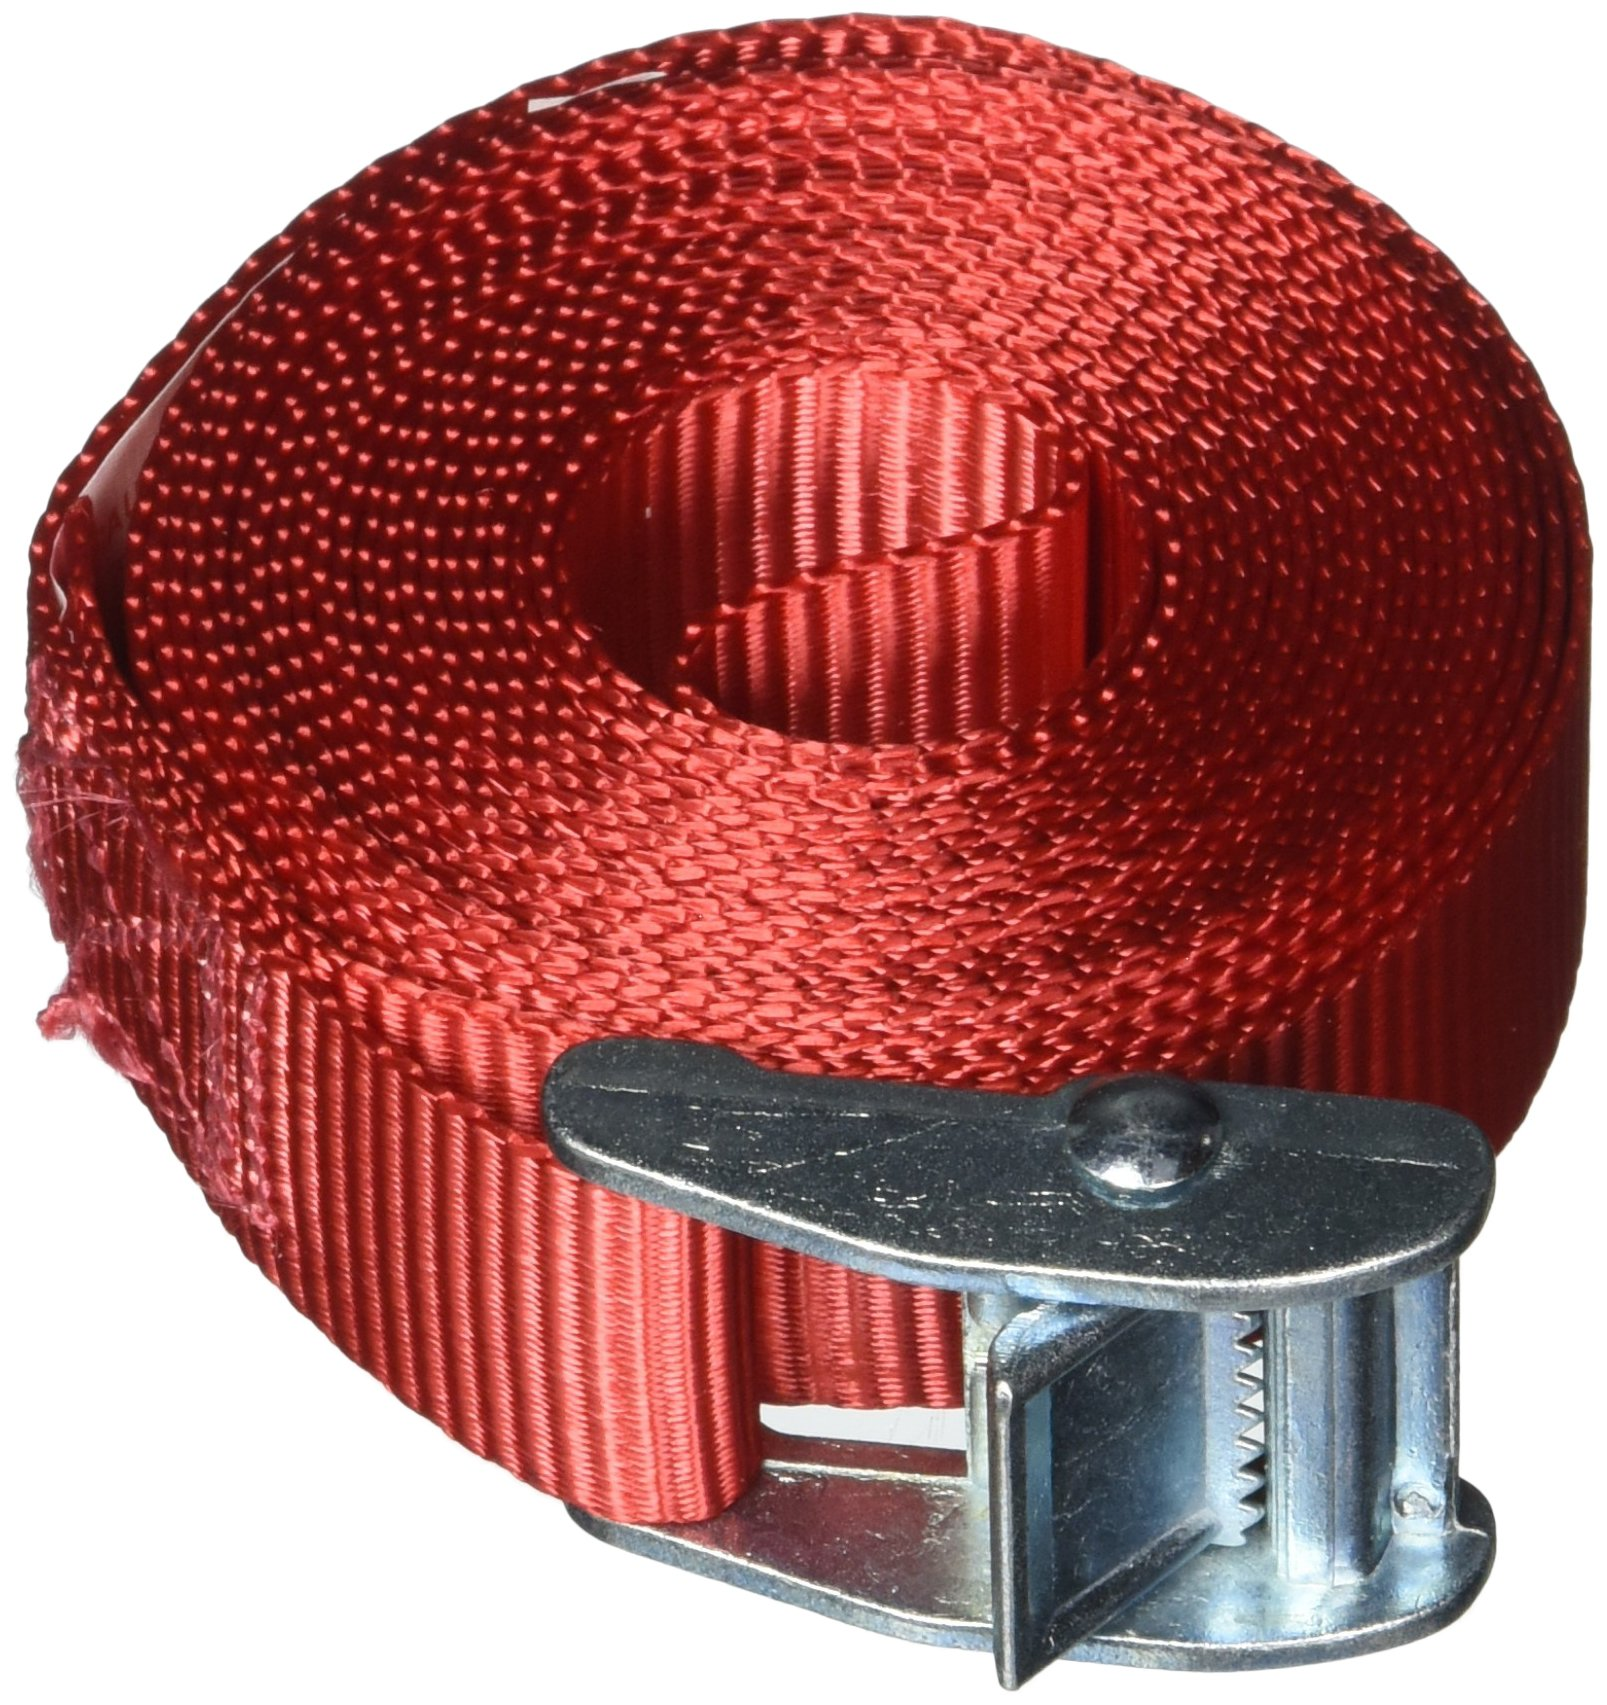 SecureLine 6262 12-Foot Lashing Strap, Red